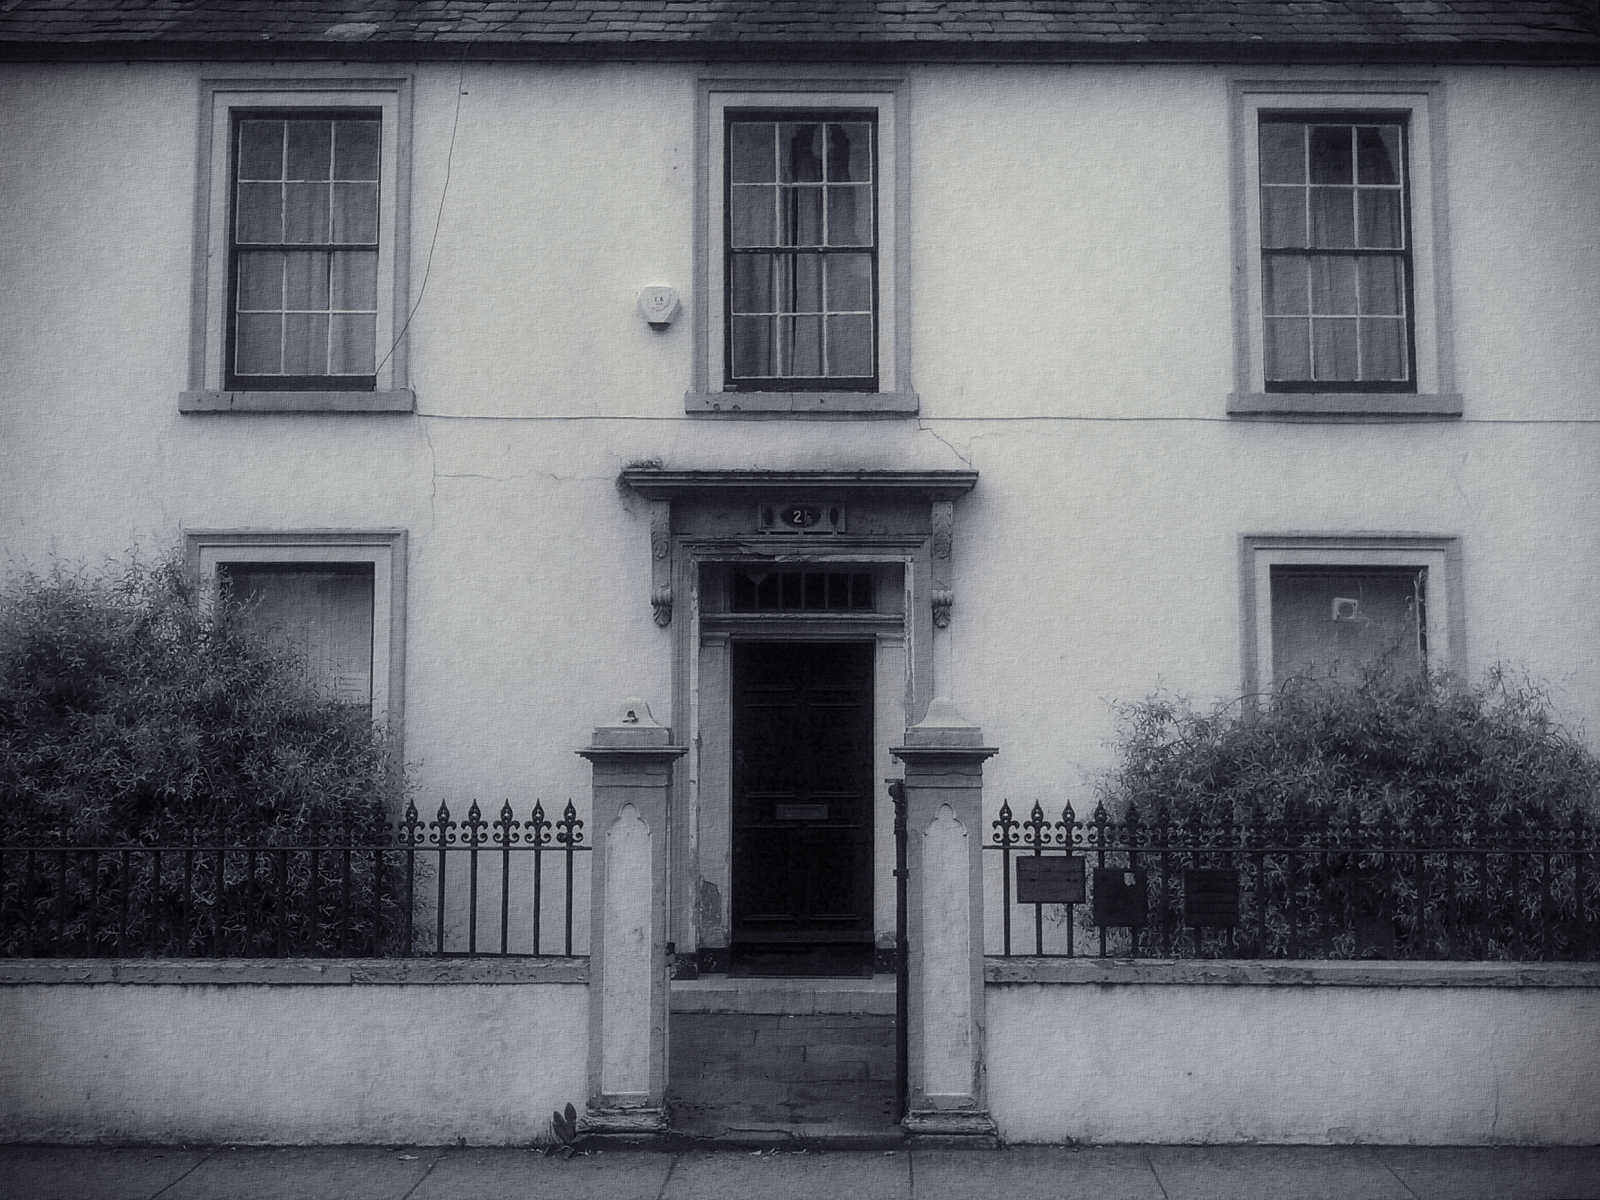 A disused former dental practice building, Lewis Street, Stranraer